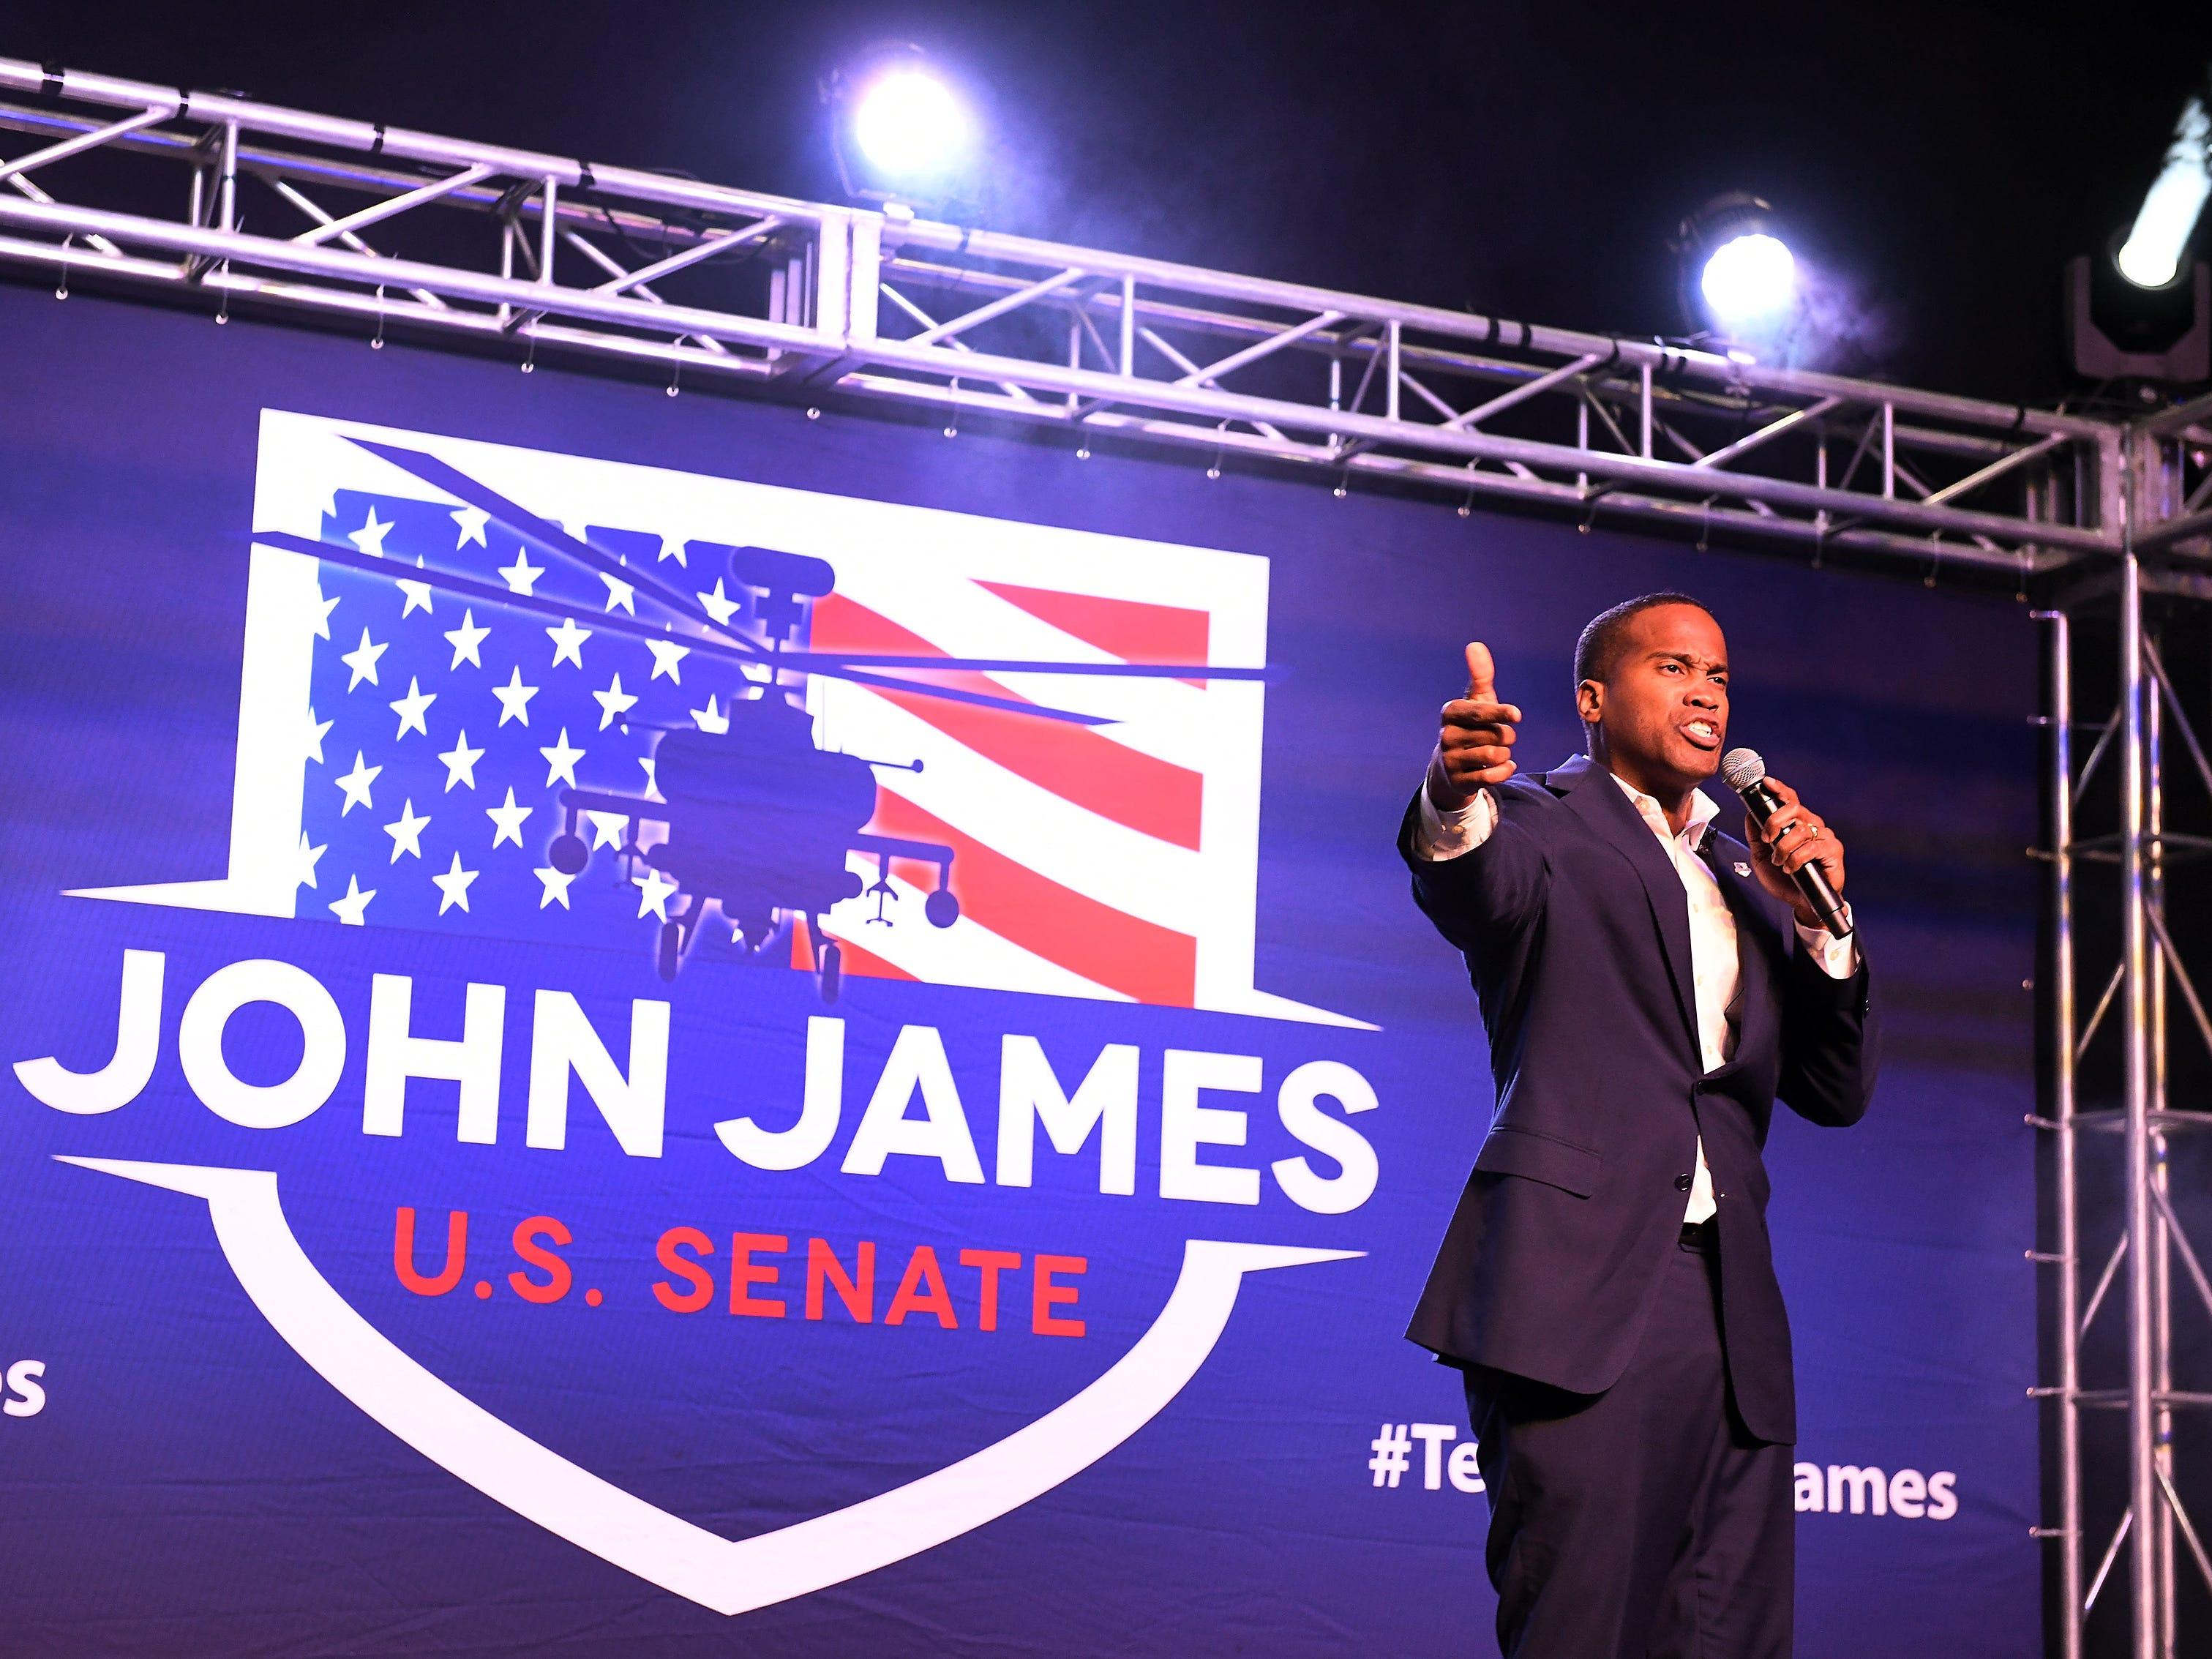 John James speaks during the rally.